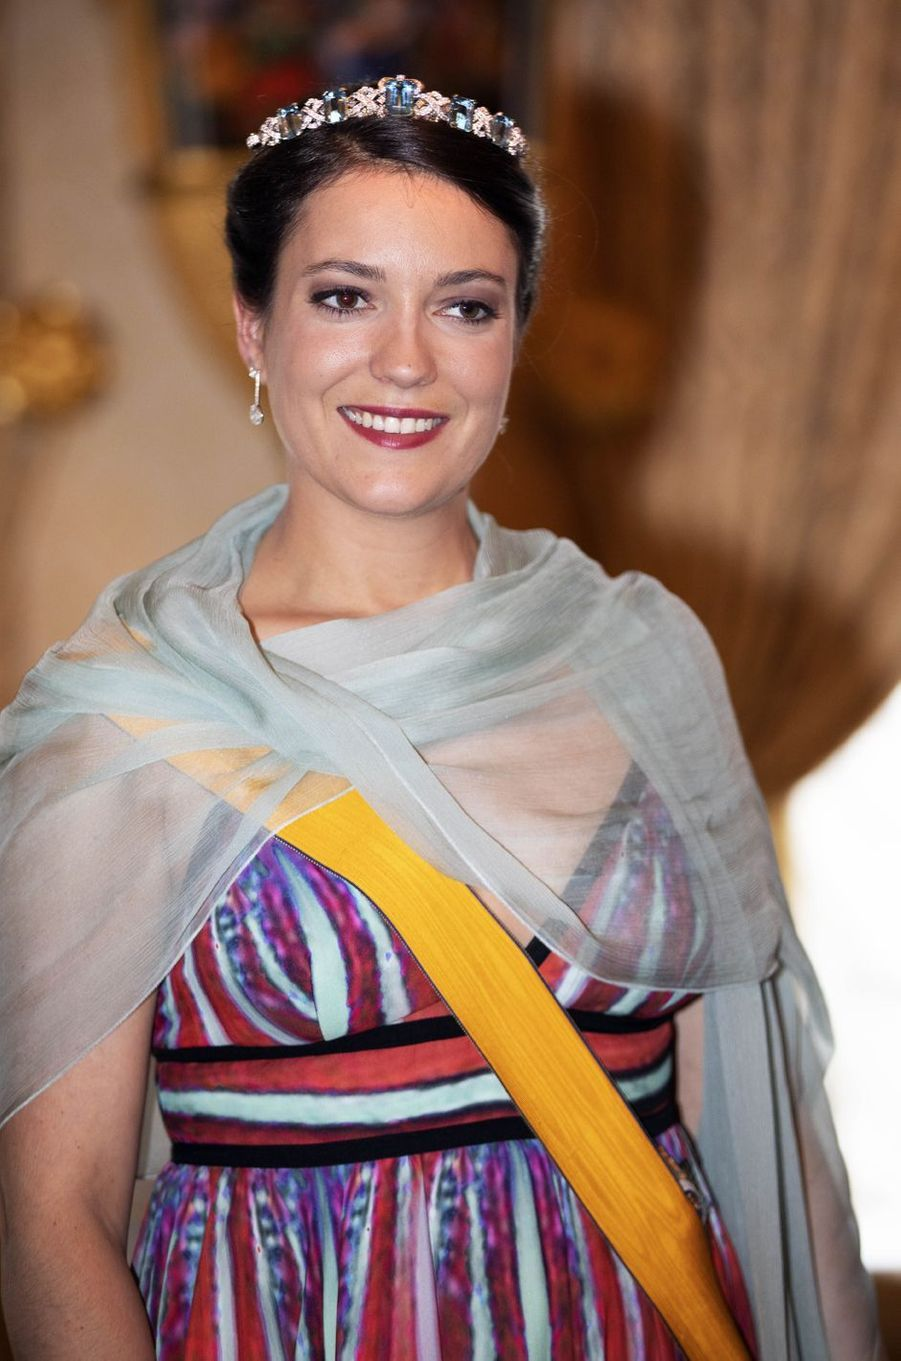 La princesse Alexandra de Luxembourg à Luxembourg, le 23 juin 2018